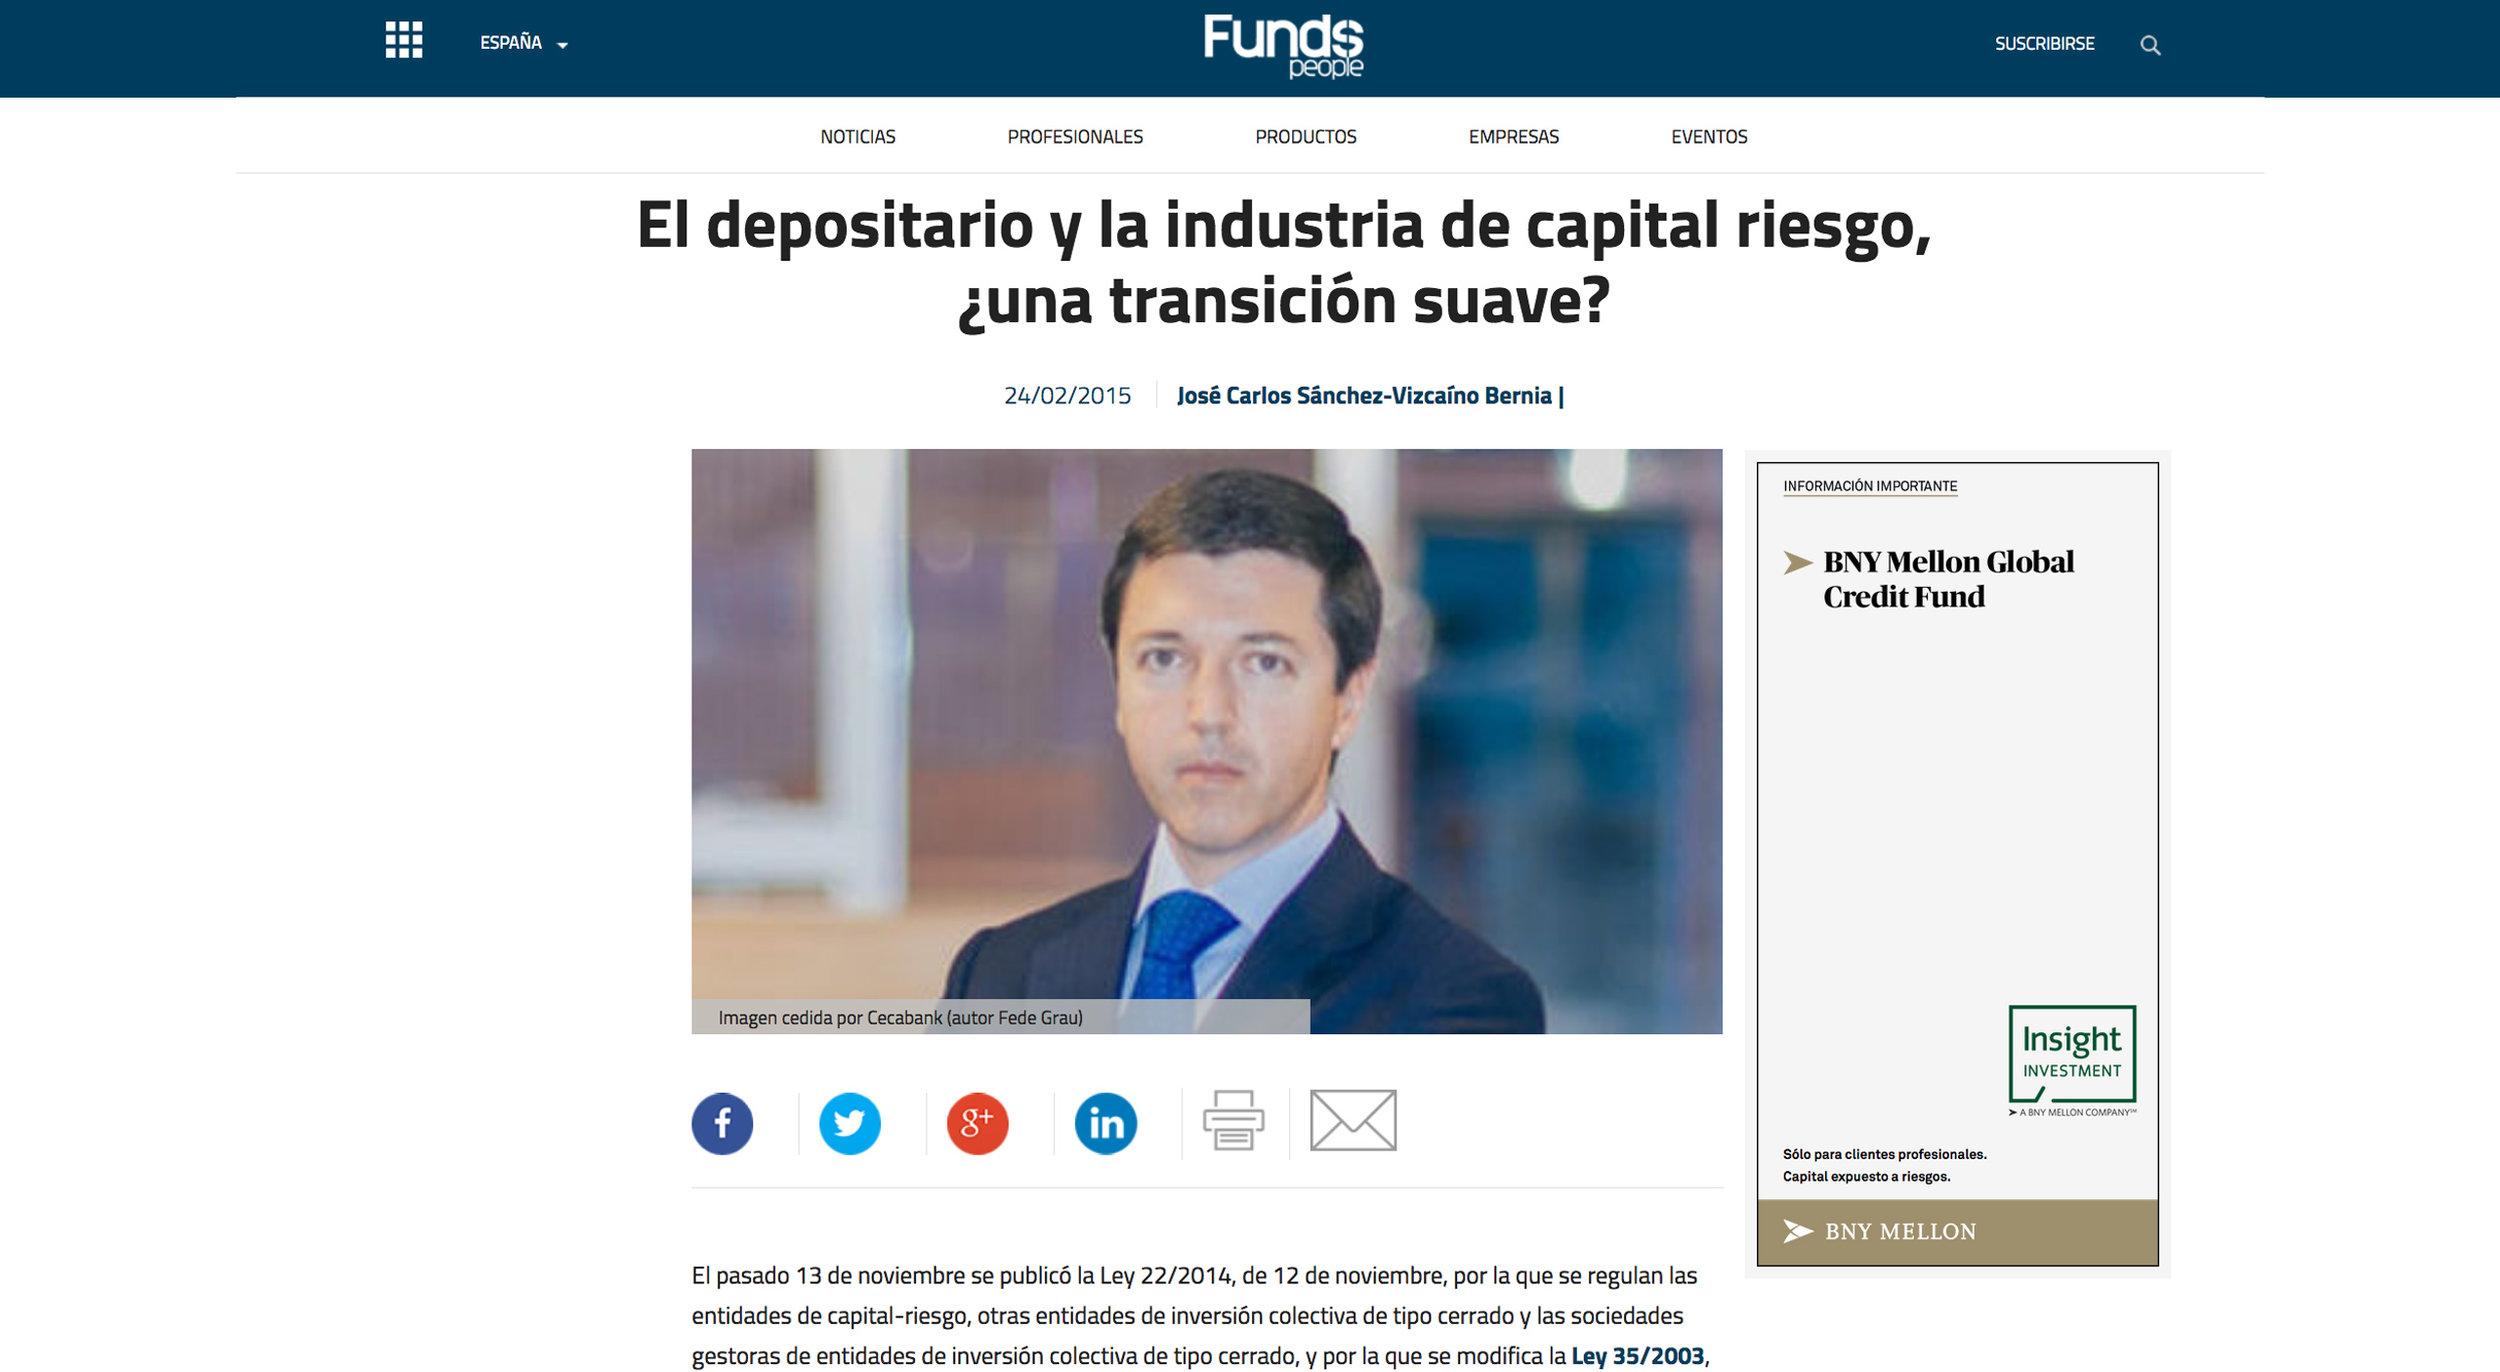 fundsPeople Pantallazo.jpg